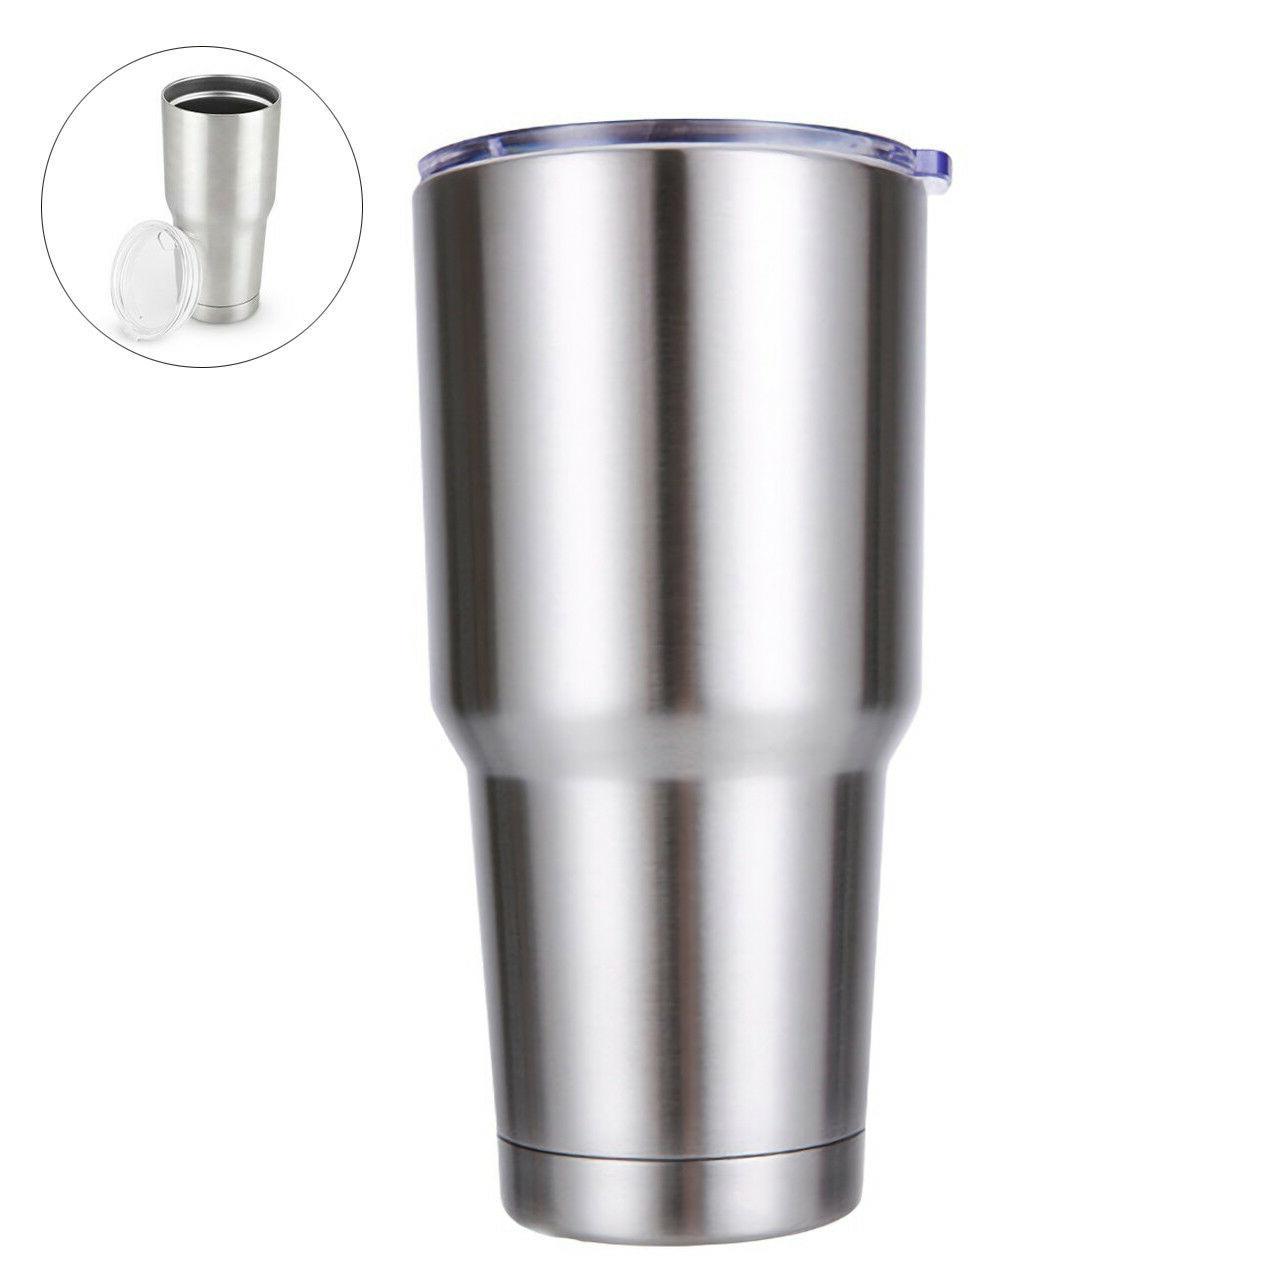 Travel Mug 30 Oz. Stainless Steel Tumbler Double Wall Vacuum